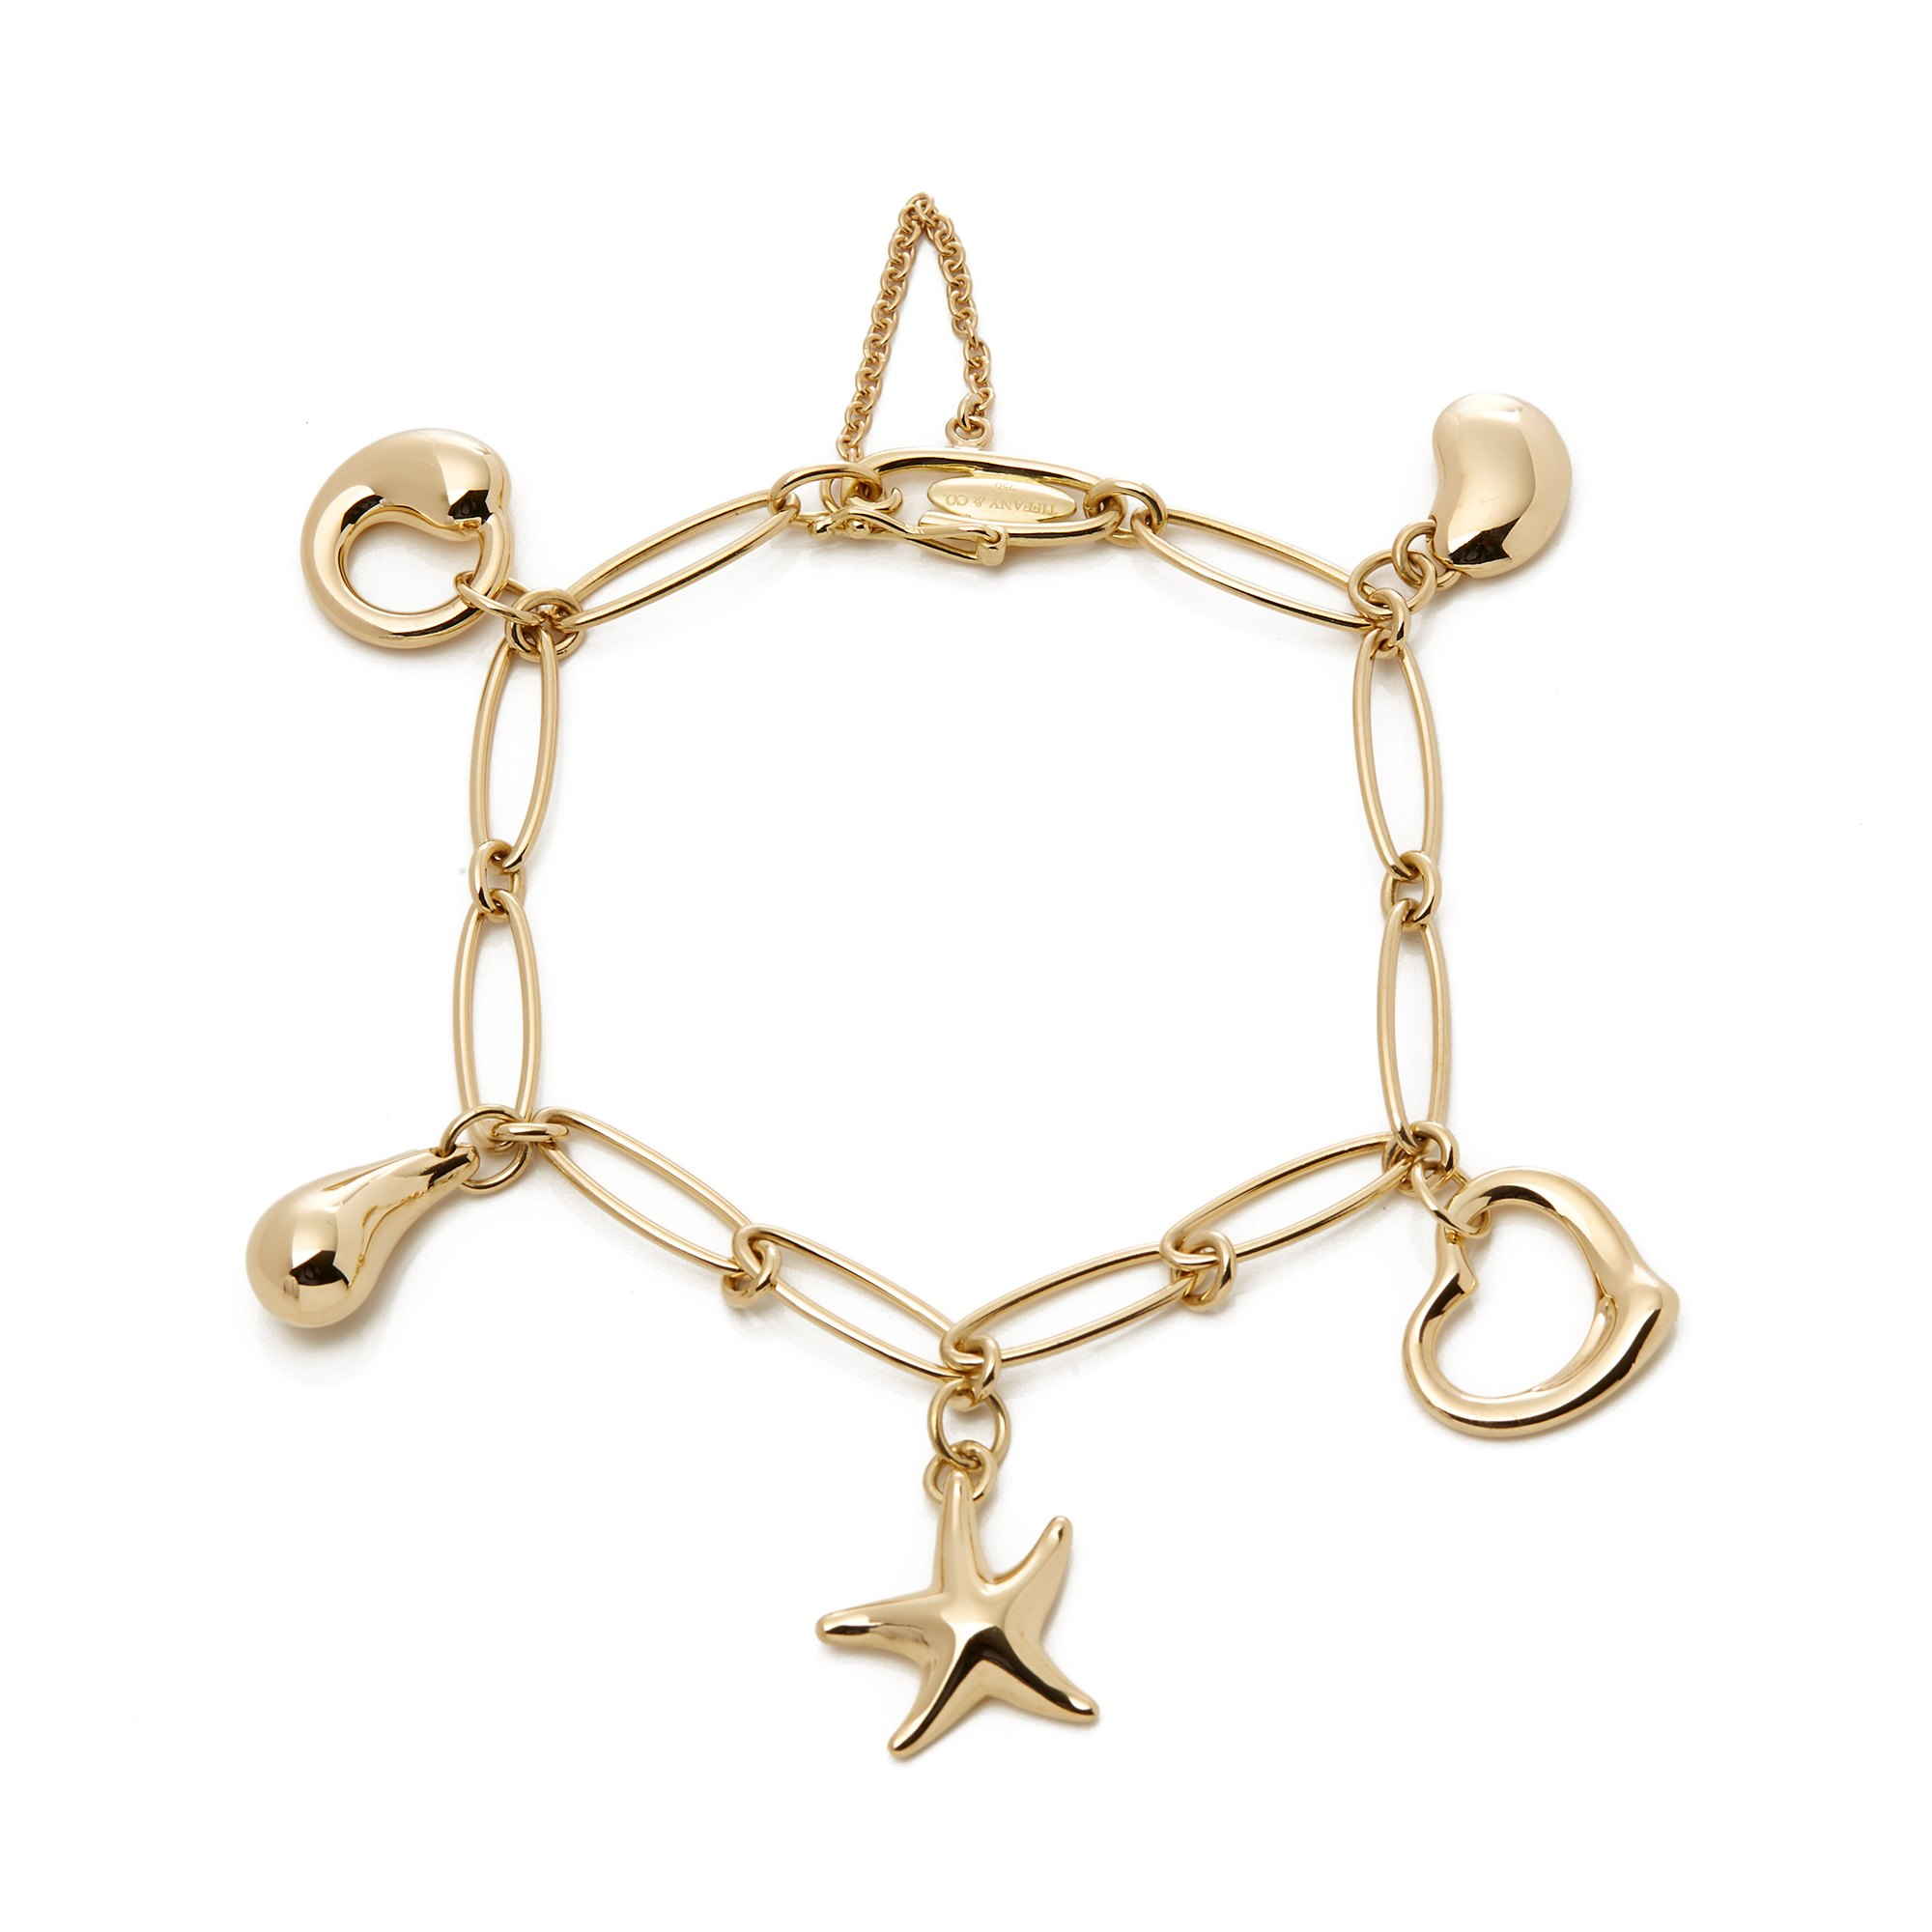 Tiffany & Co. Elsa Peretti 18ct Gold 5 Charm Bracelet